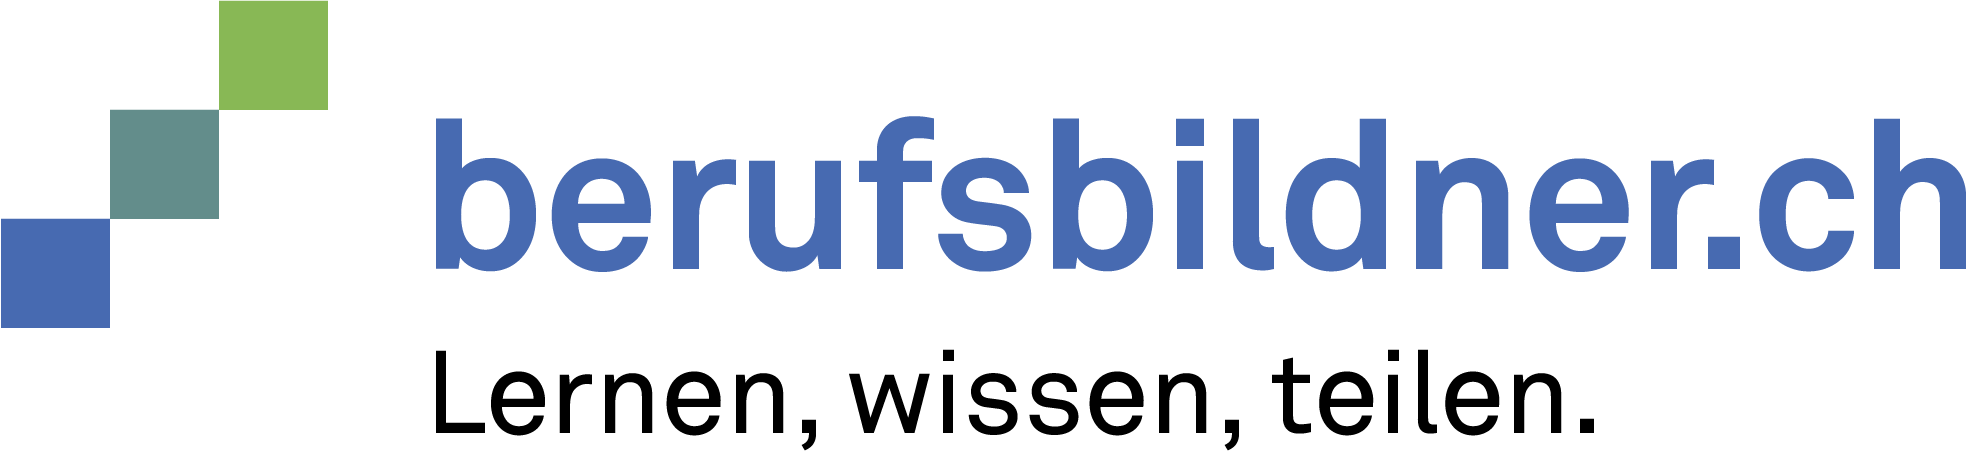 Berufsbildner Logo